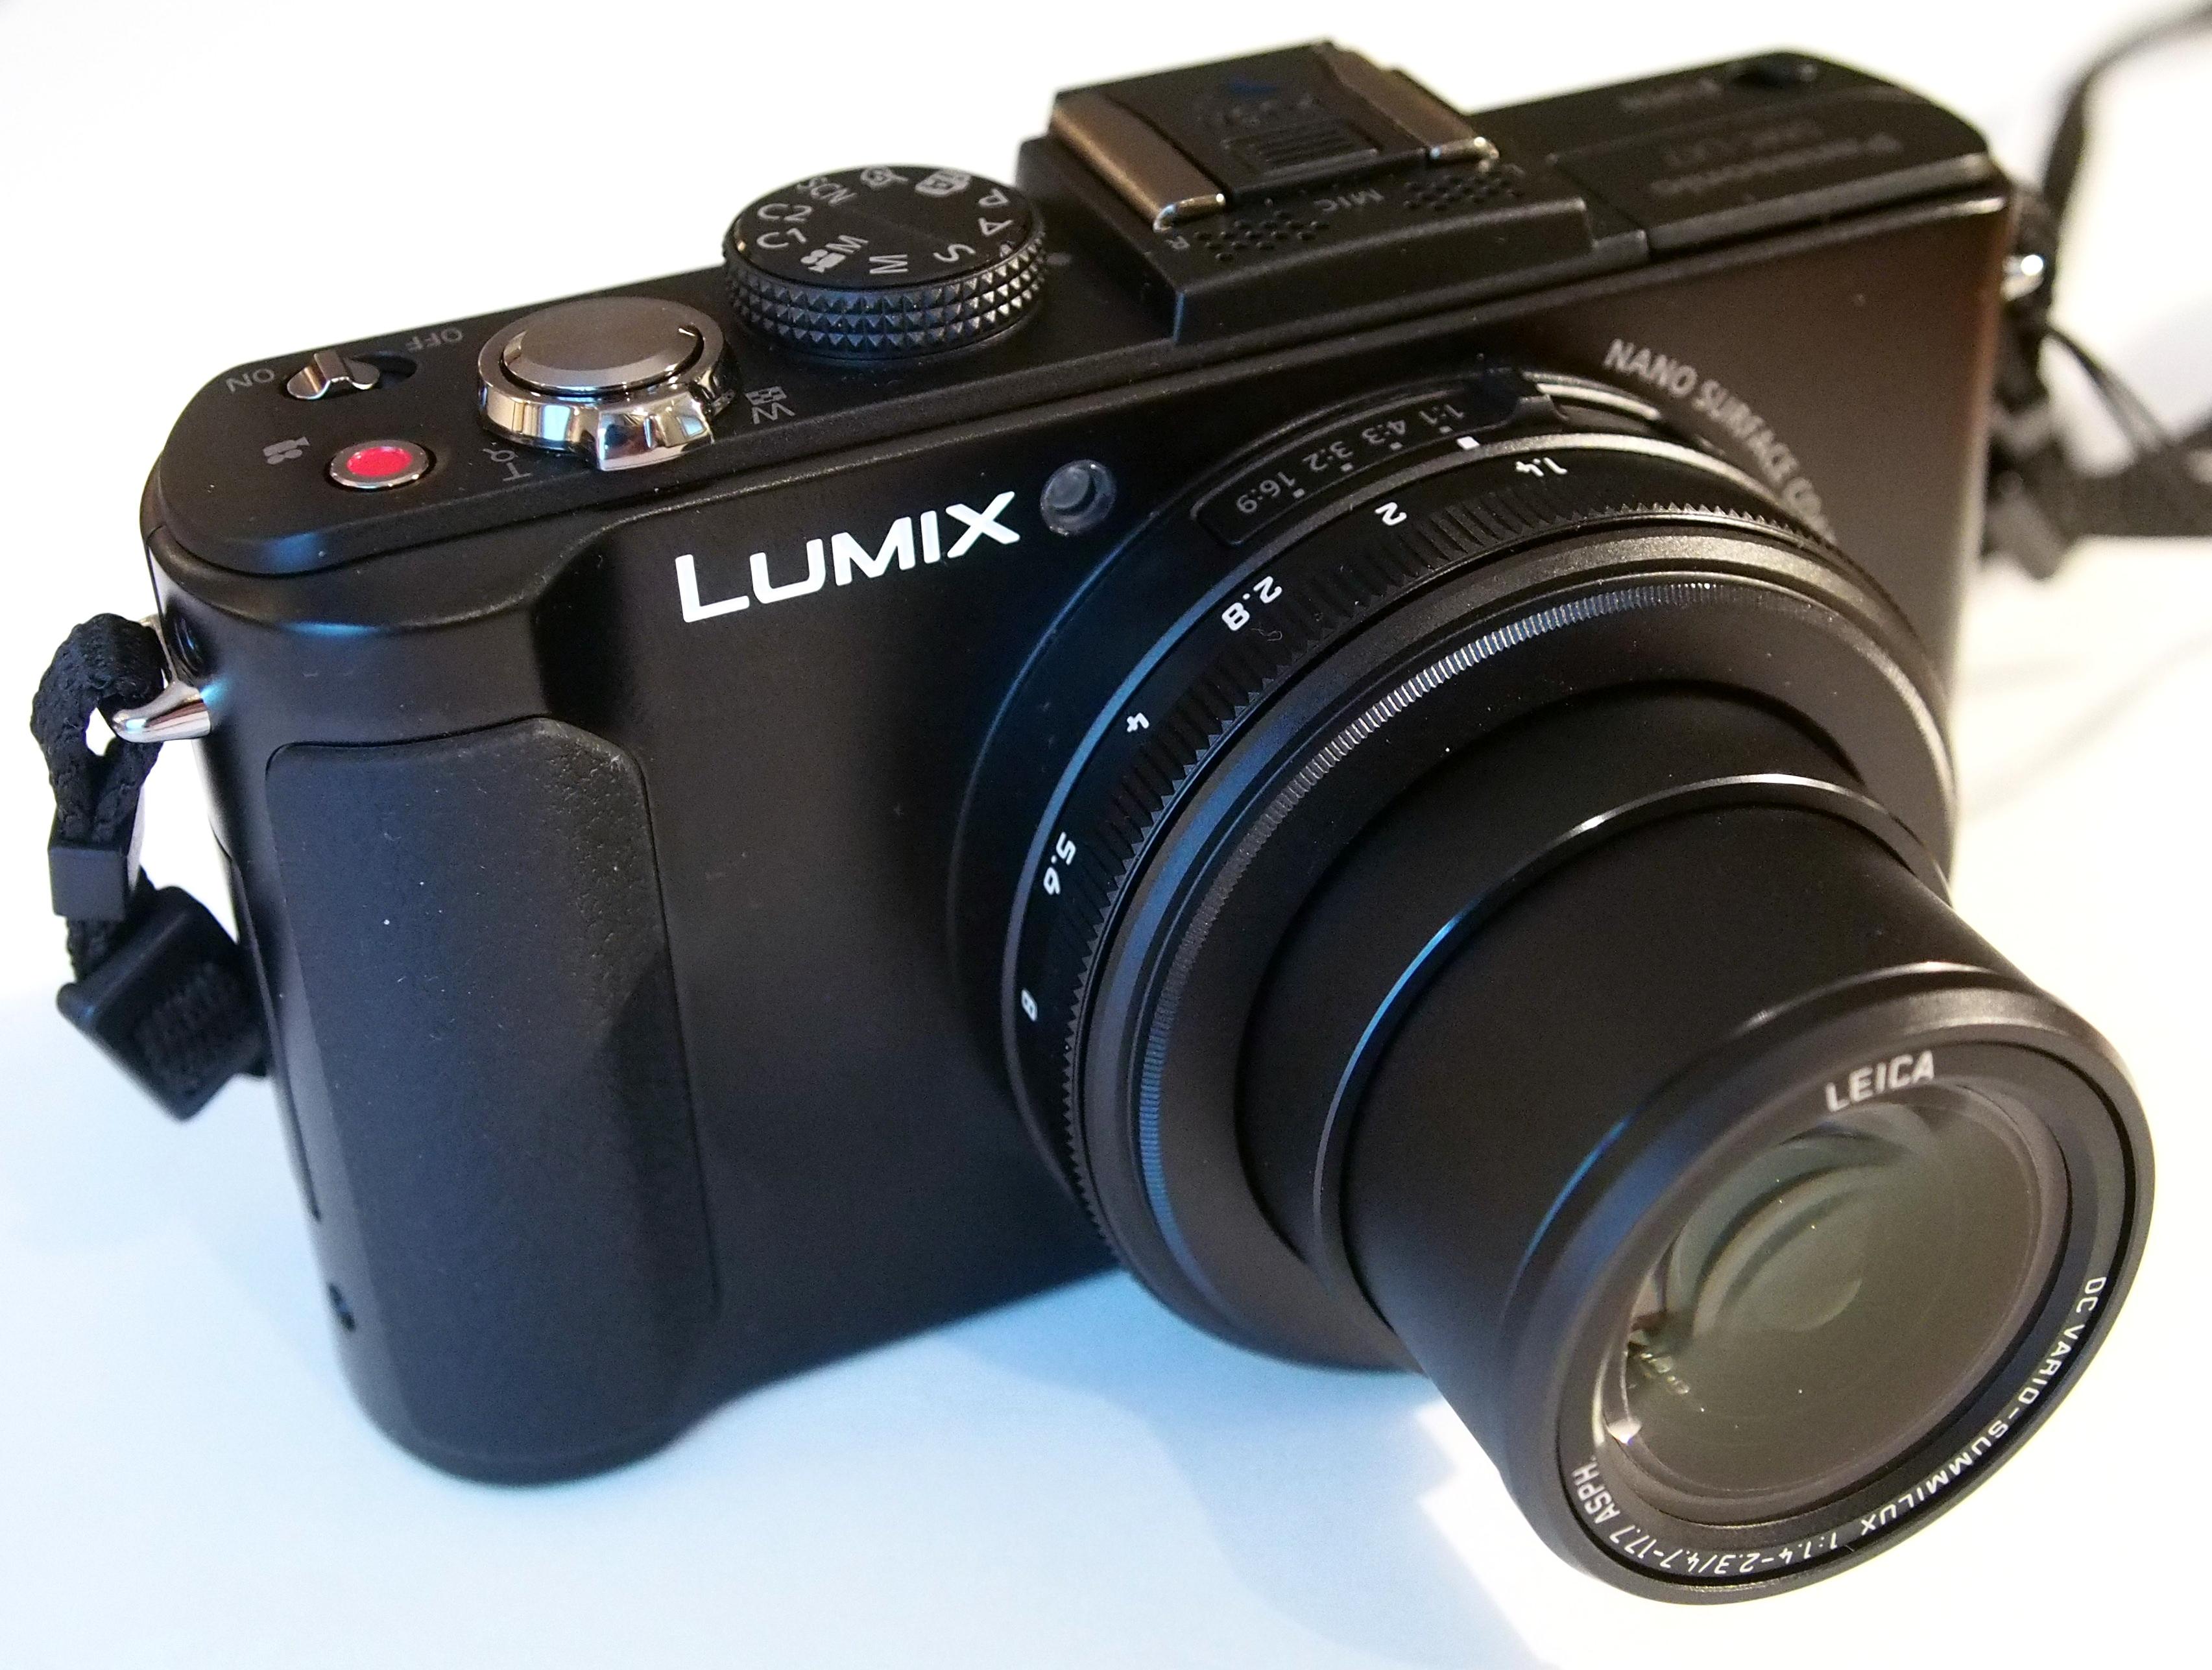 Panasonic lumix dmc-lx7 manuals.